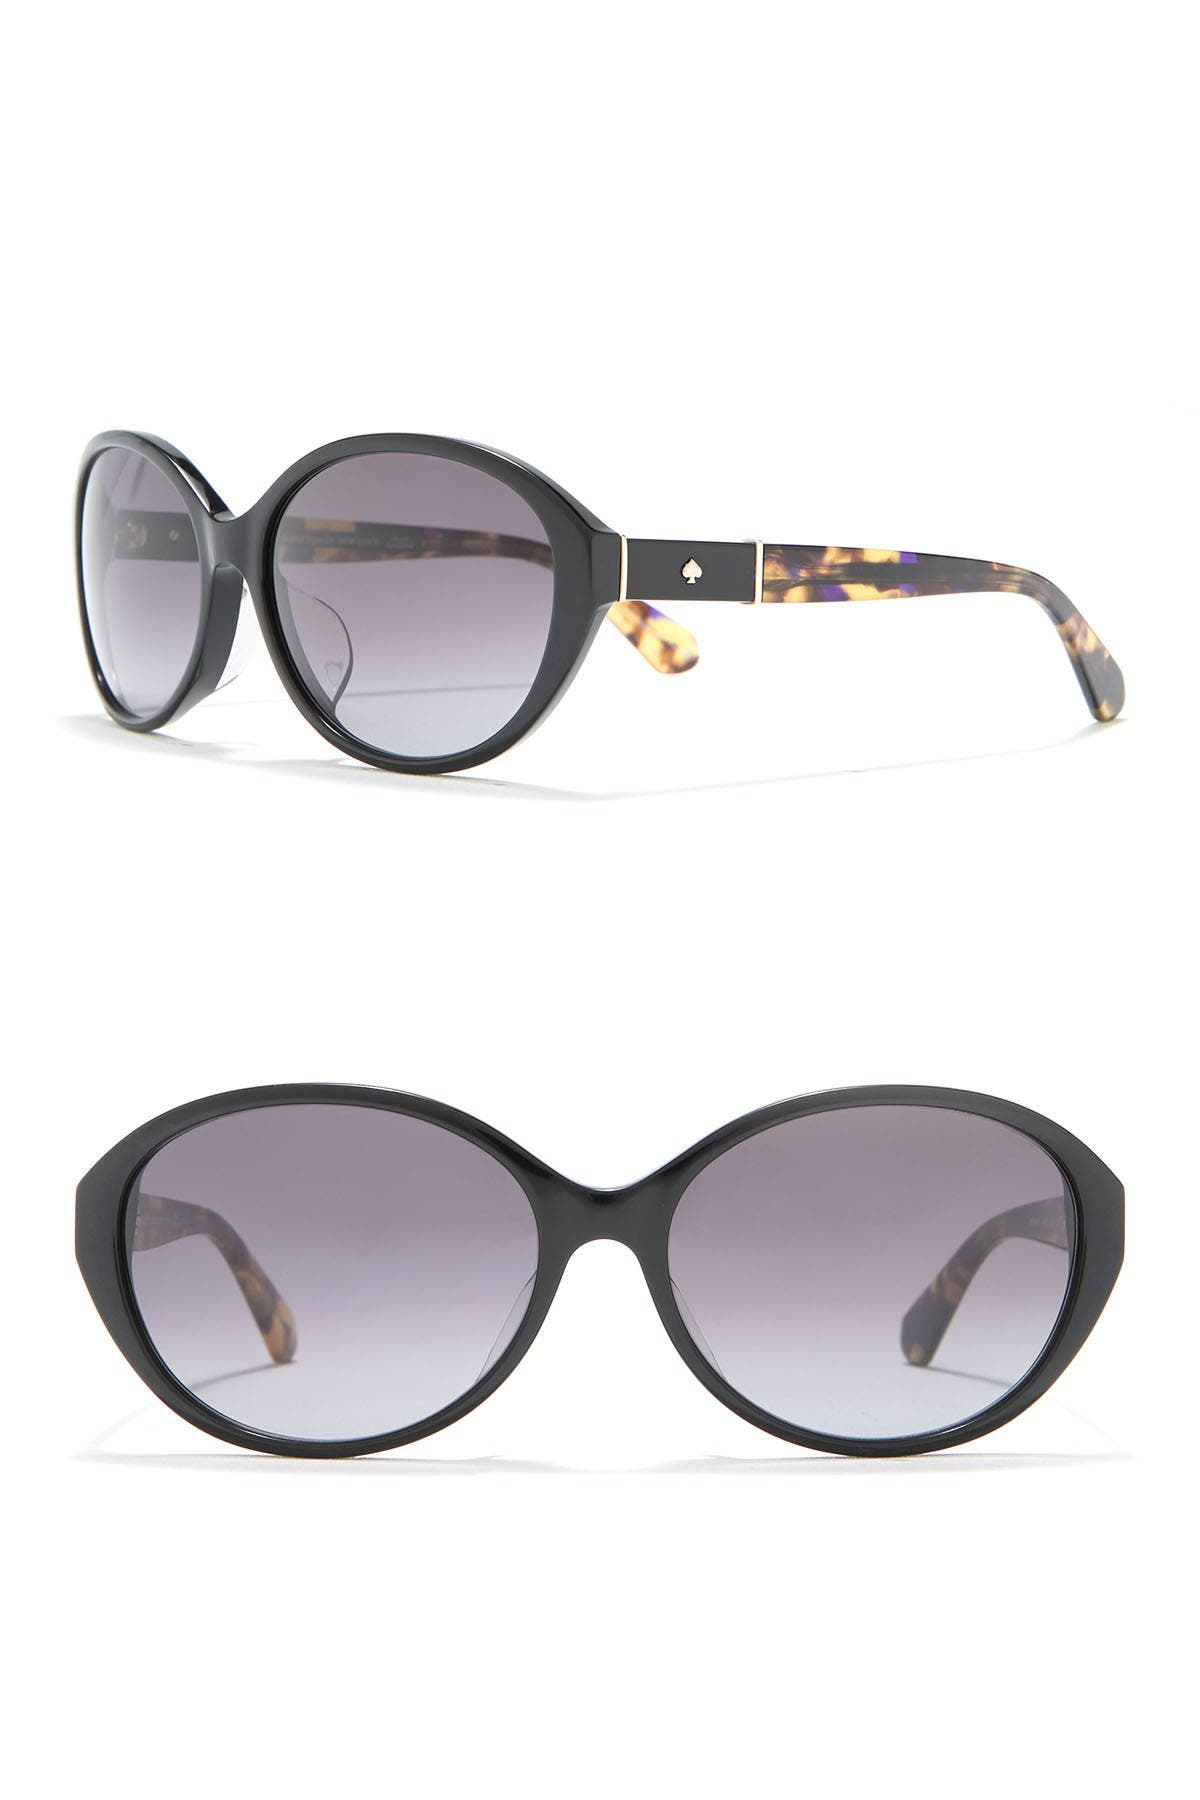 Image of kate spade new york catrine 58mm oval sunglasses